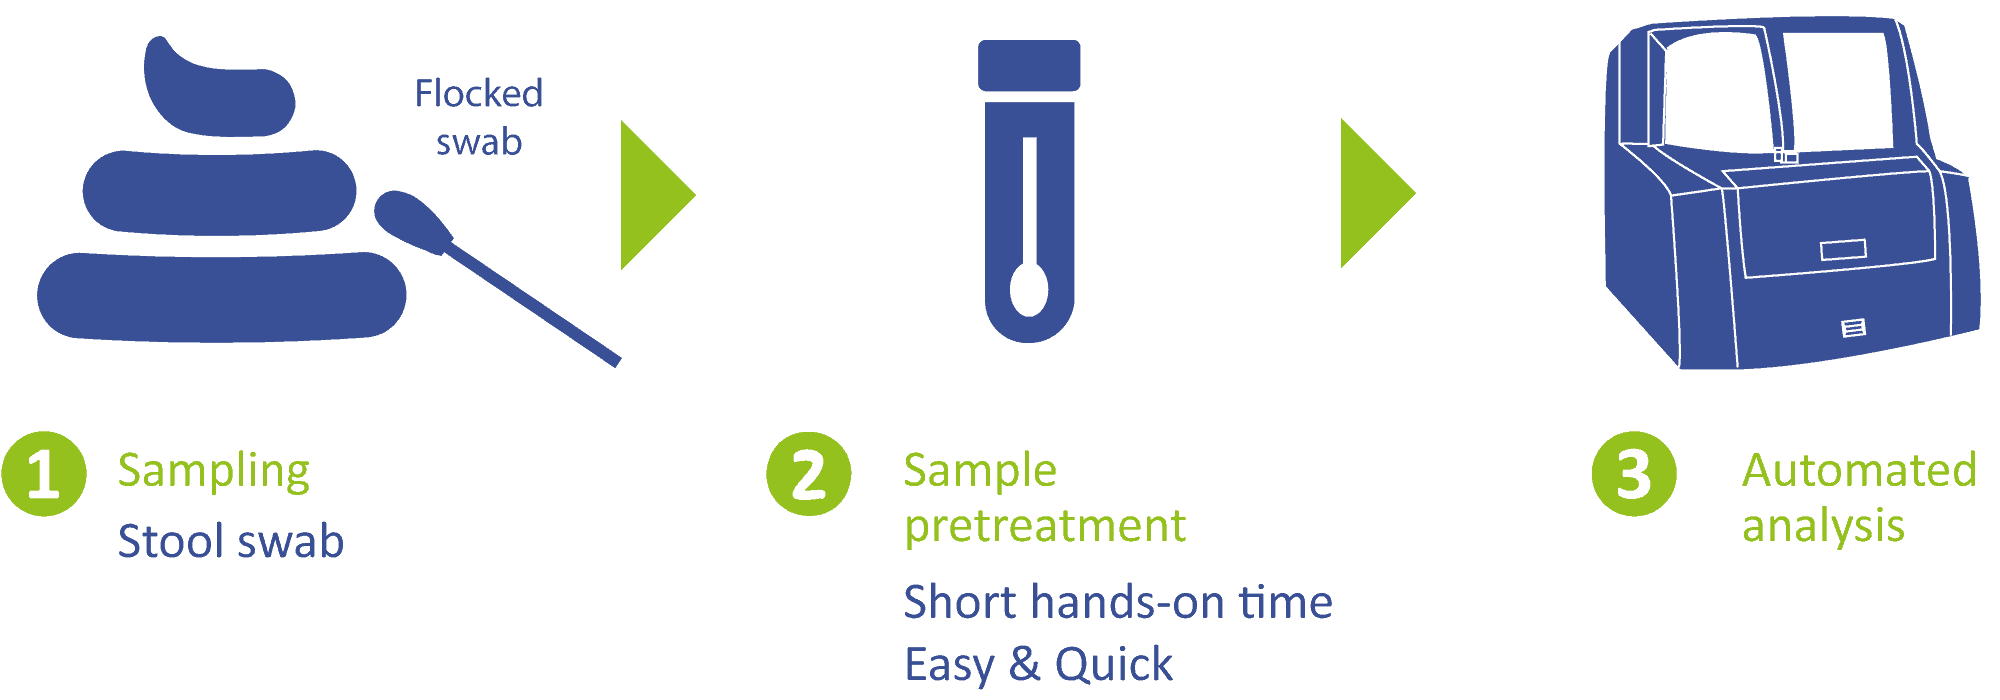 Gastro test sampling